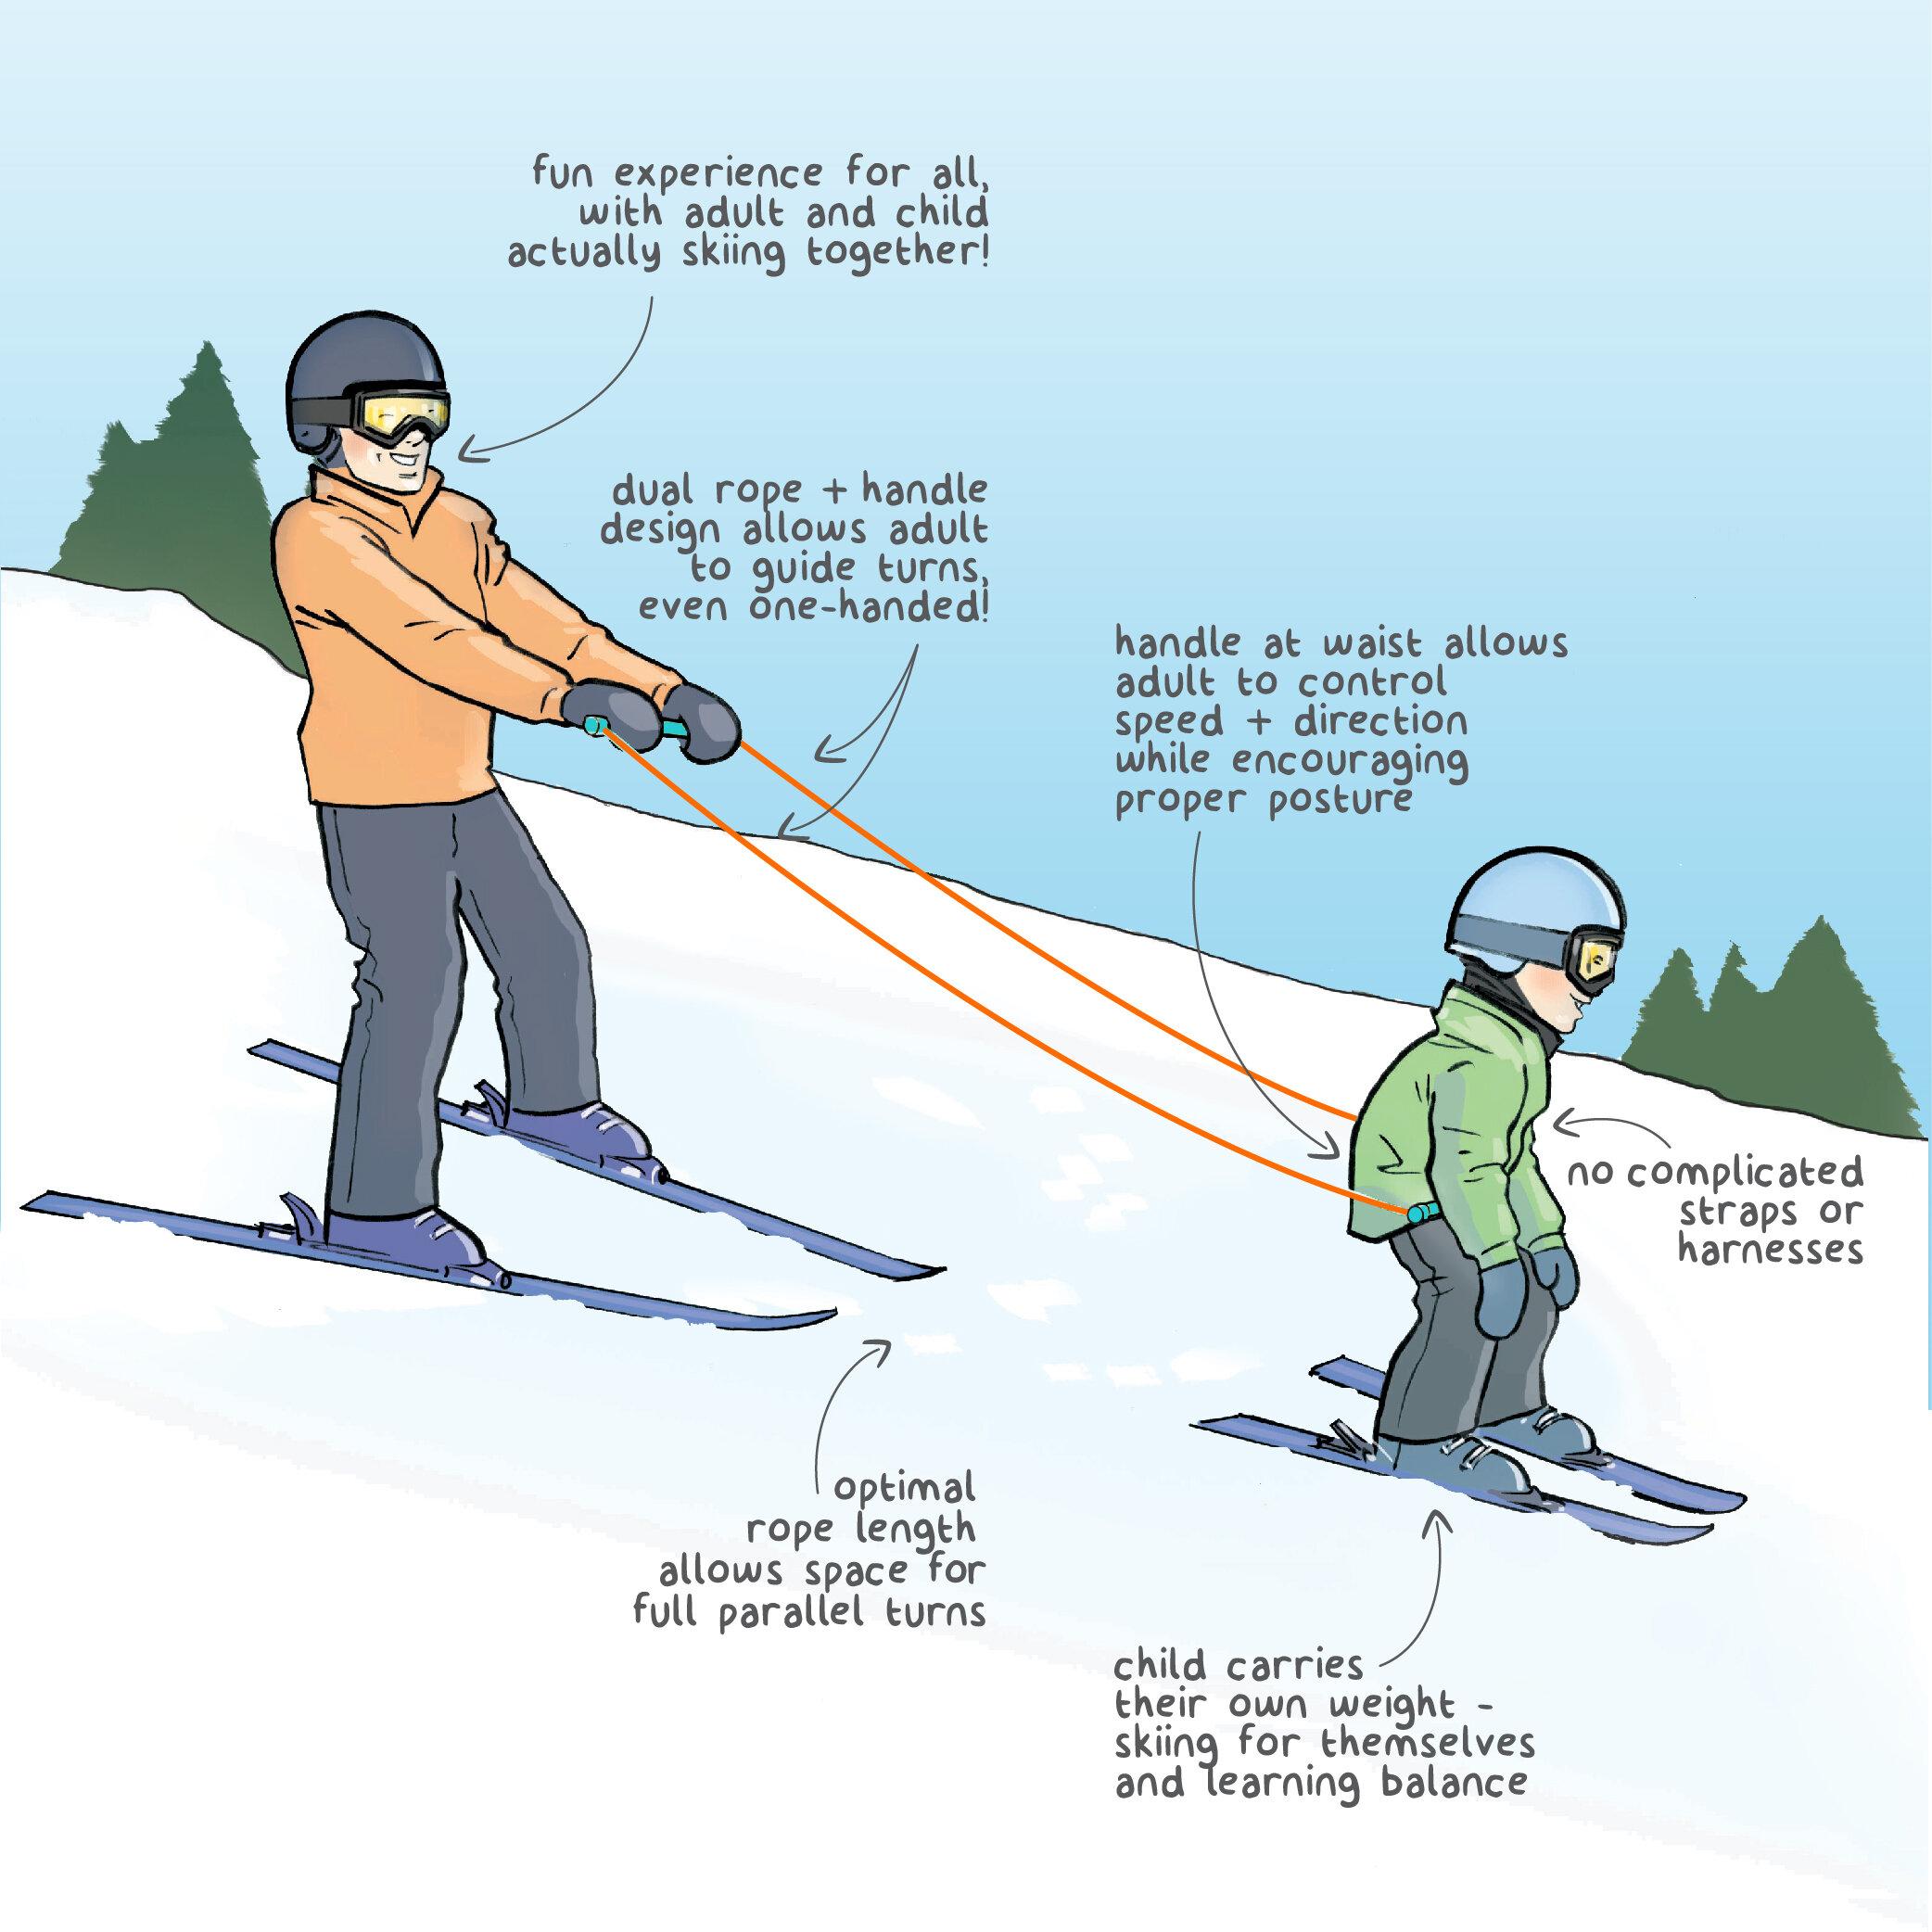 Kids Waist ski Harness learn to ski kids Ski Harness ski trainer NEW